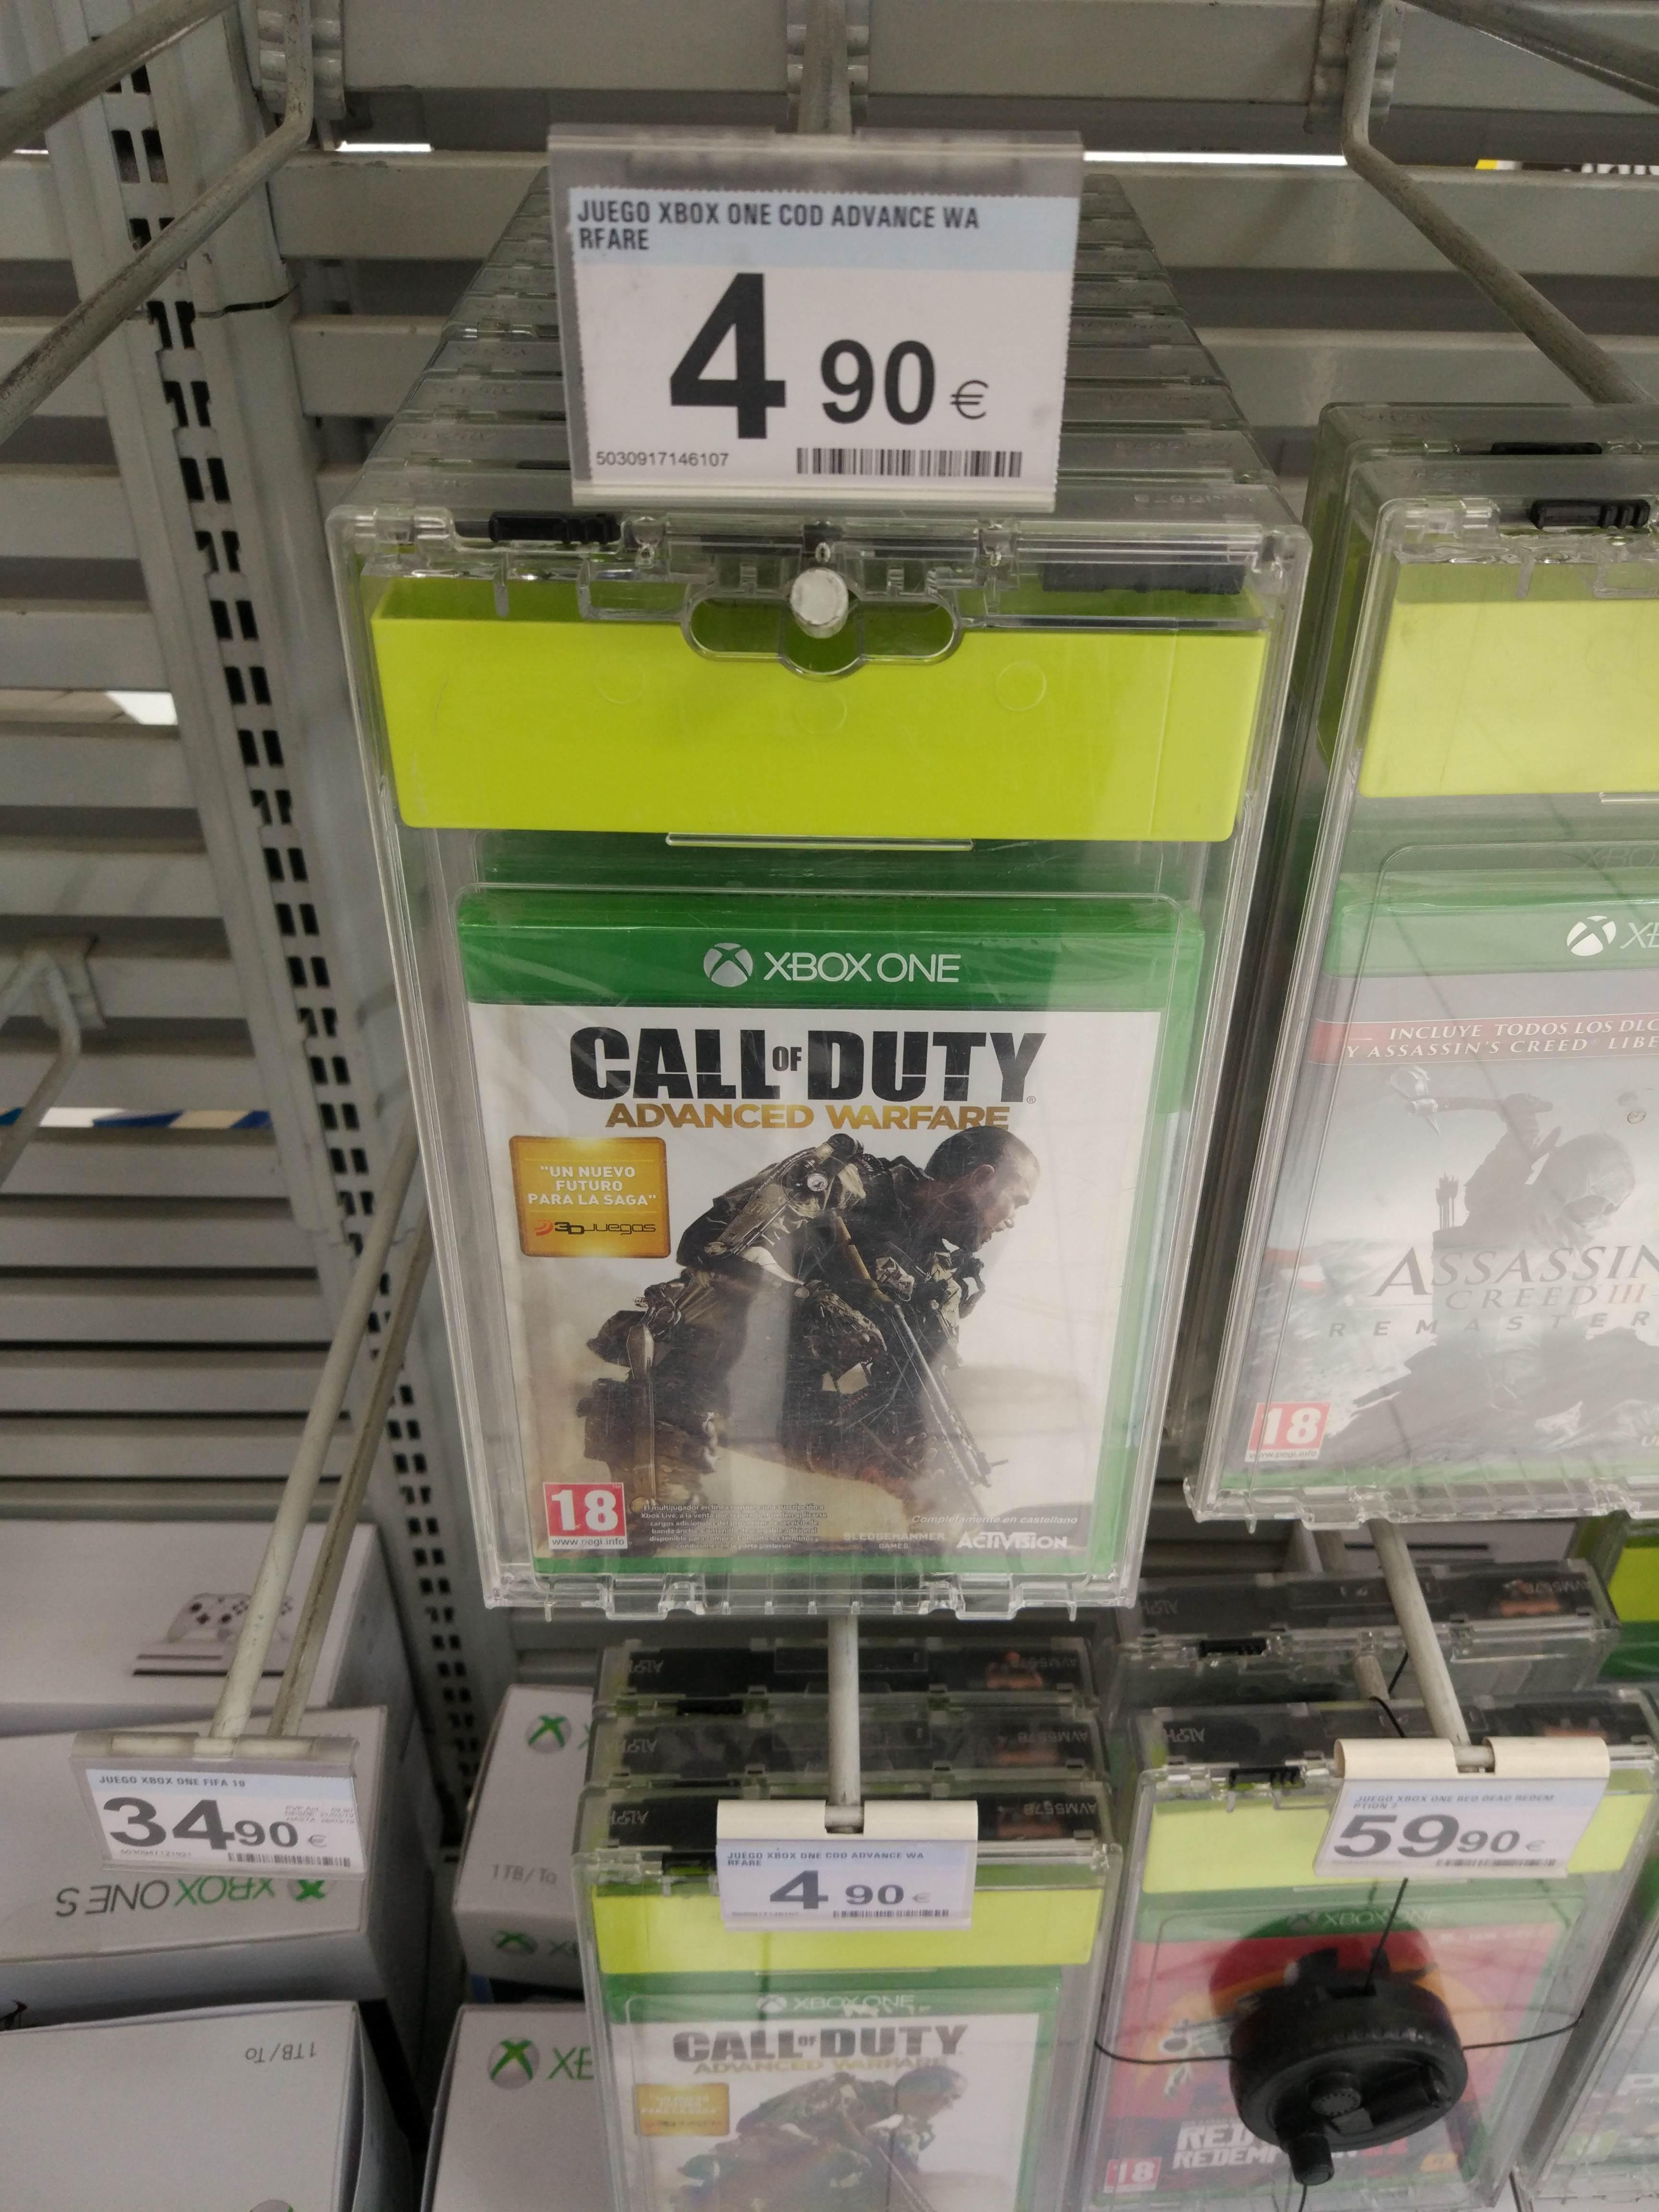 XBOX ONE: Call of duty: Advanced Warfare